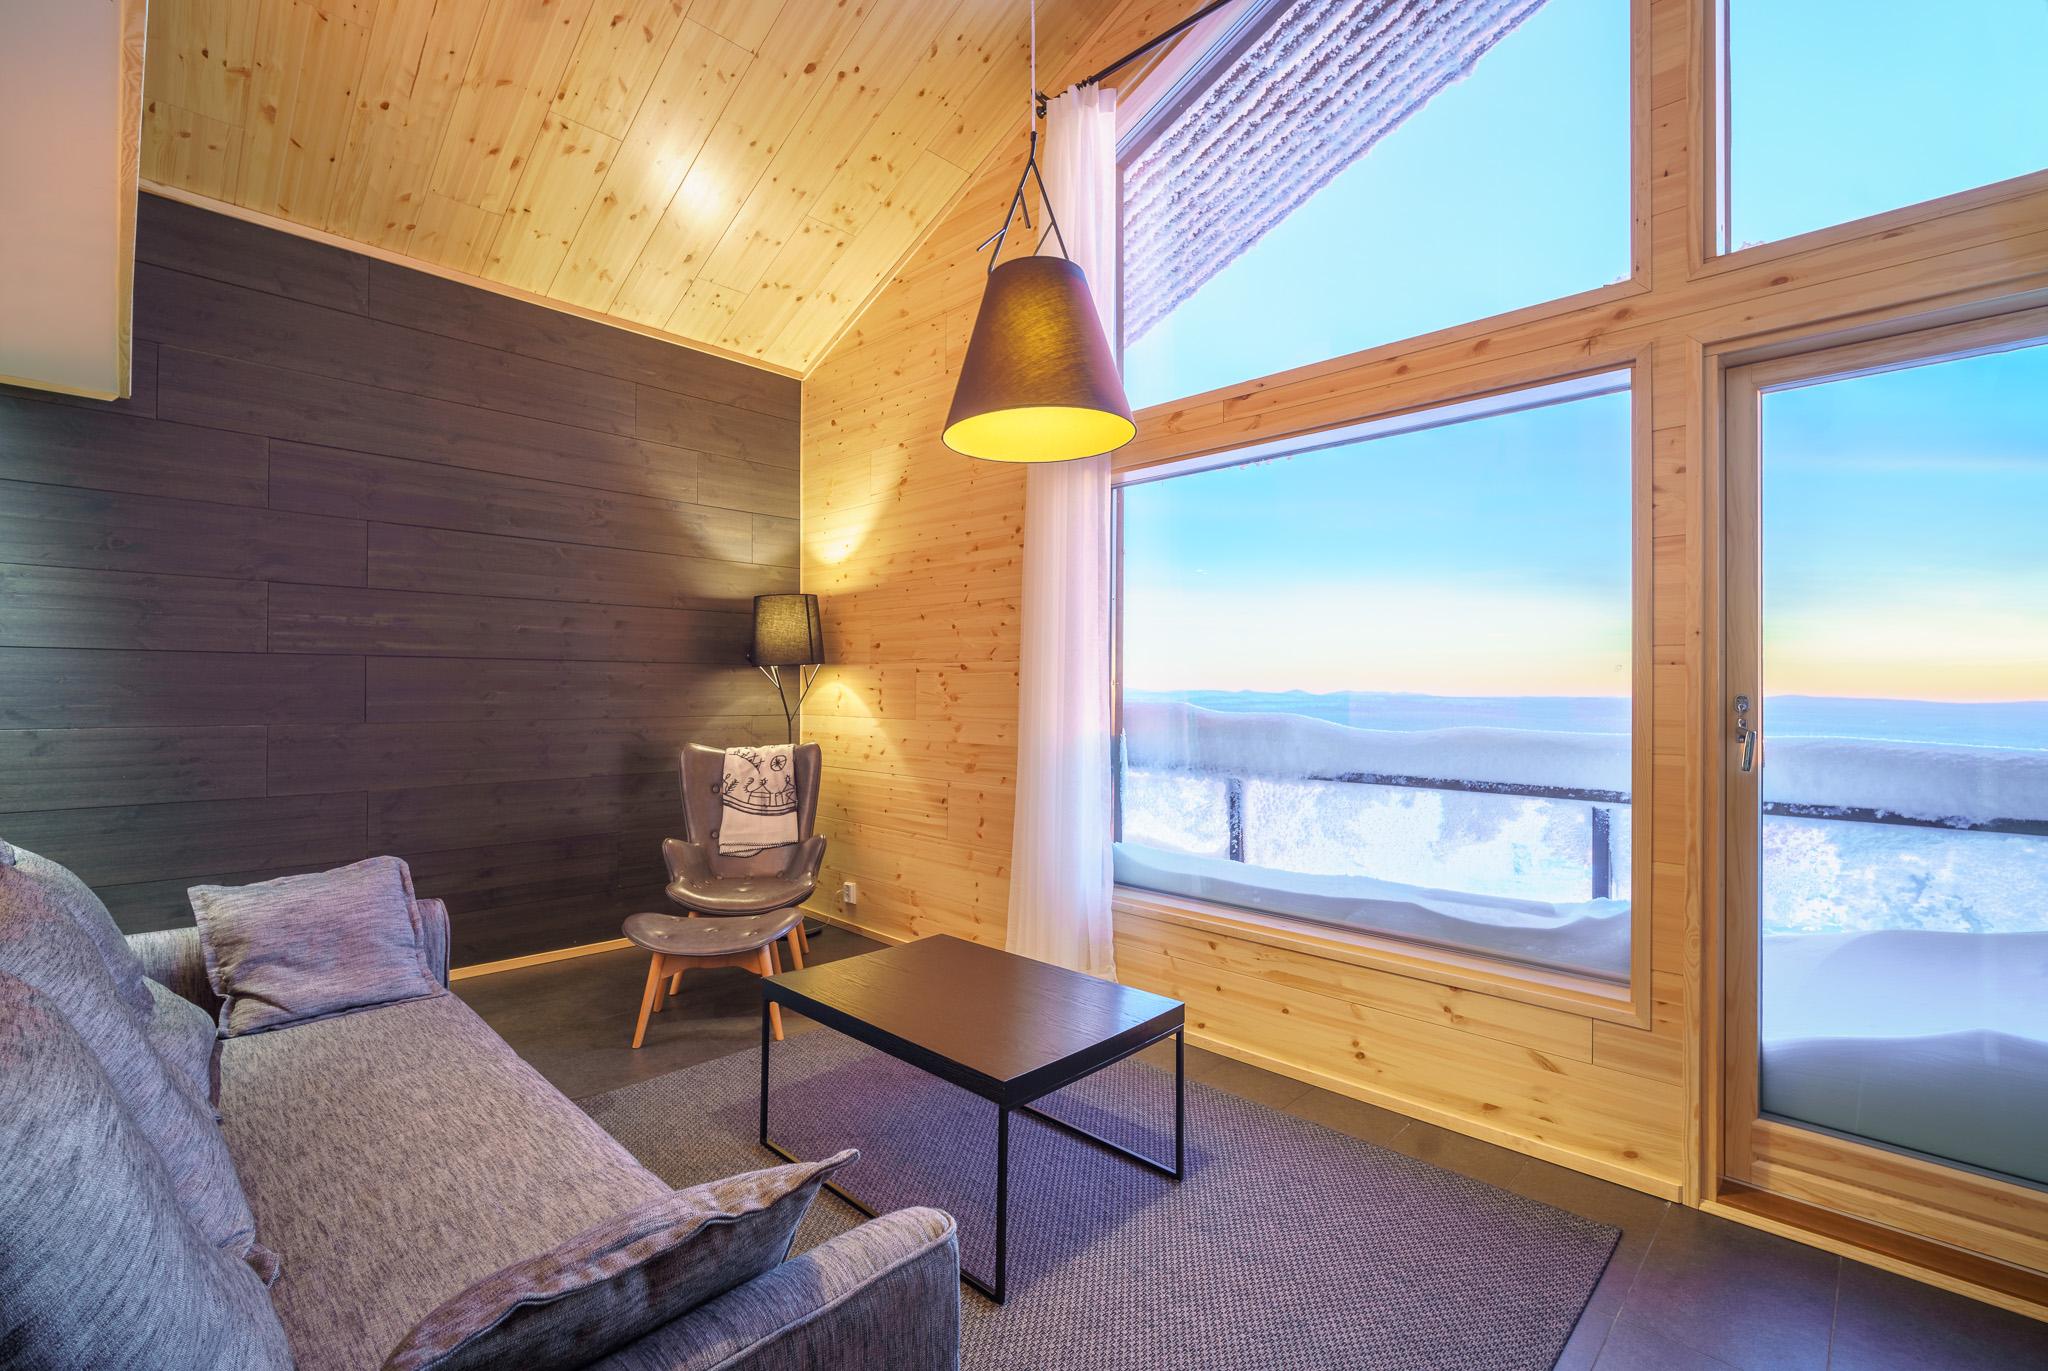 Star Arctic Hotel